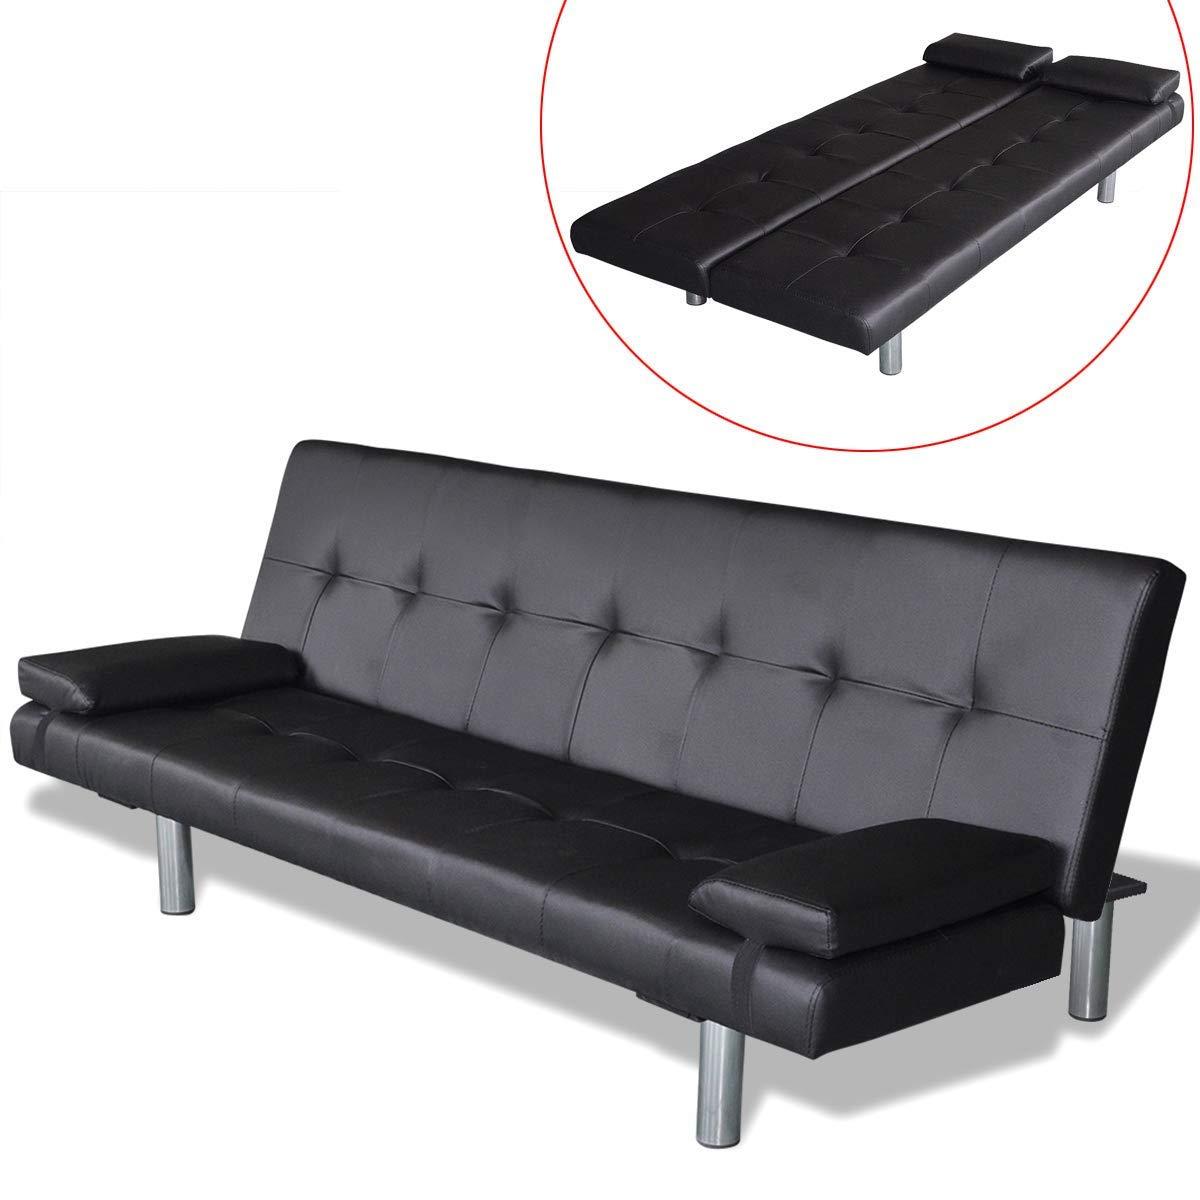 Vidaxl Kunstleder Sofabett Sofa Couch Couch Sofa Schlafcouch